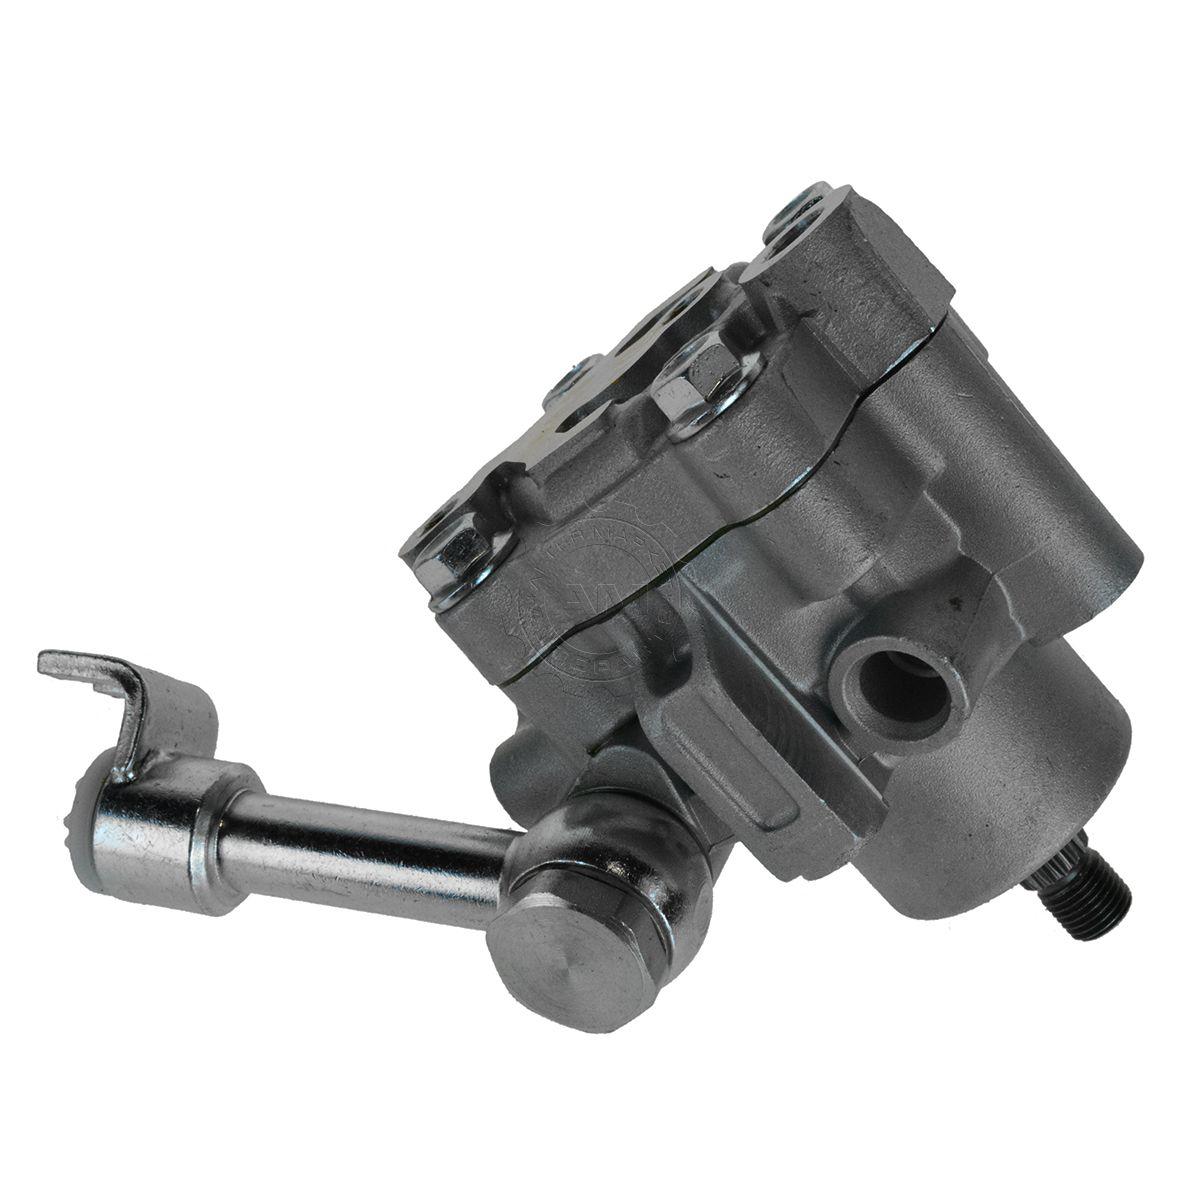 Power Steering Pump For Nissan Altima Maxima Quest V6 3.5L 192659155832